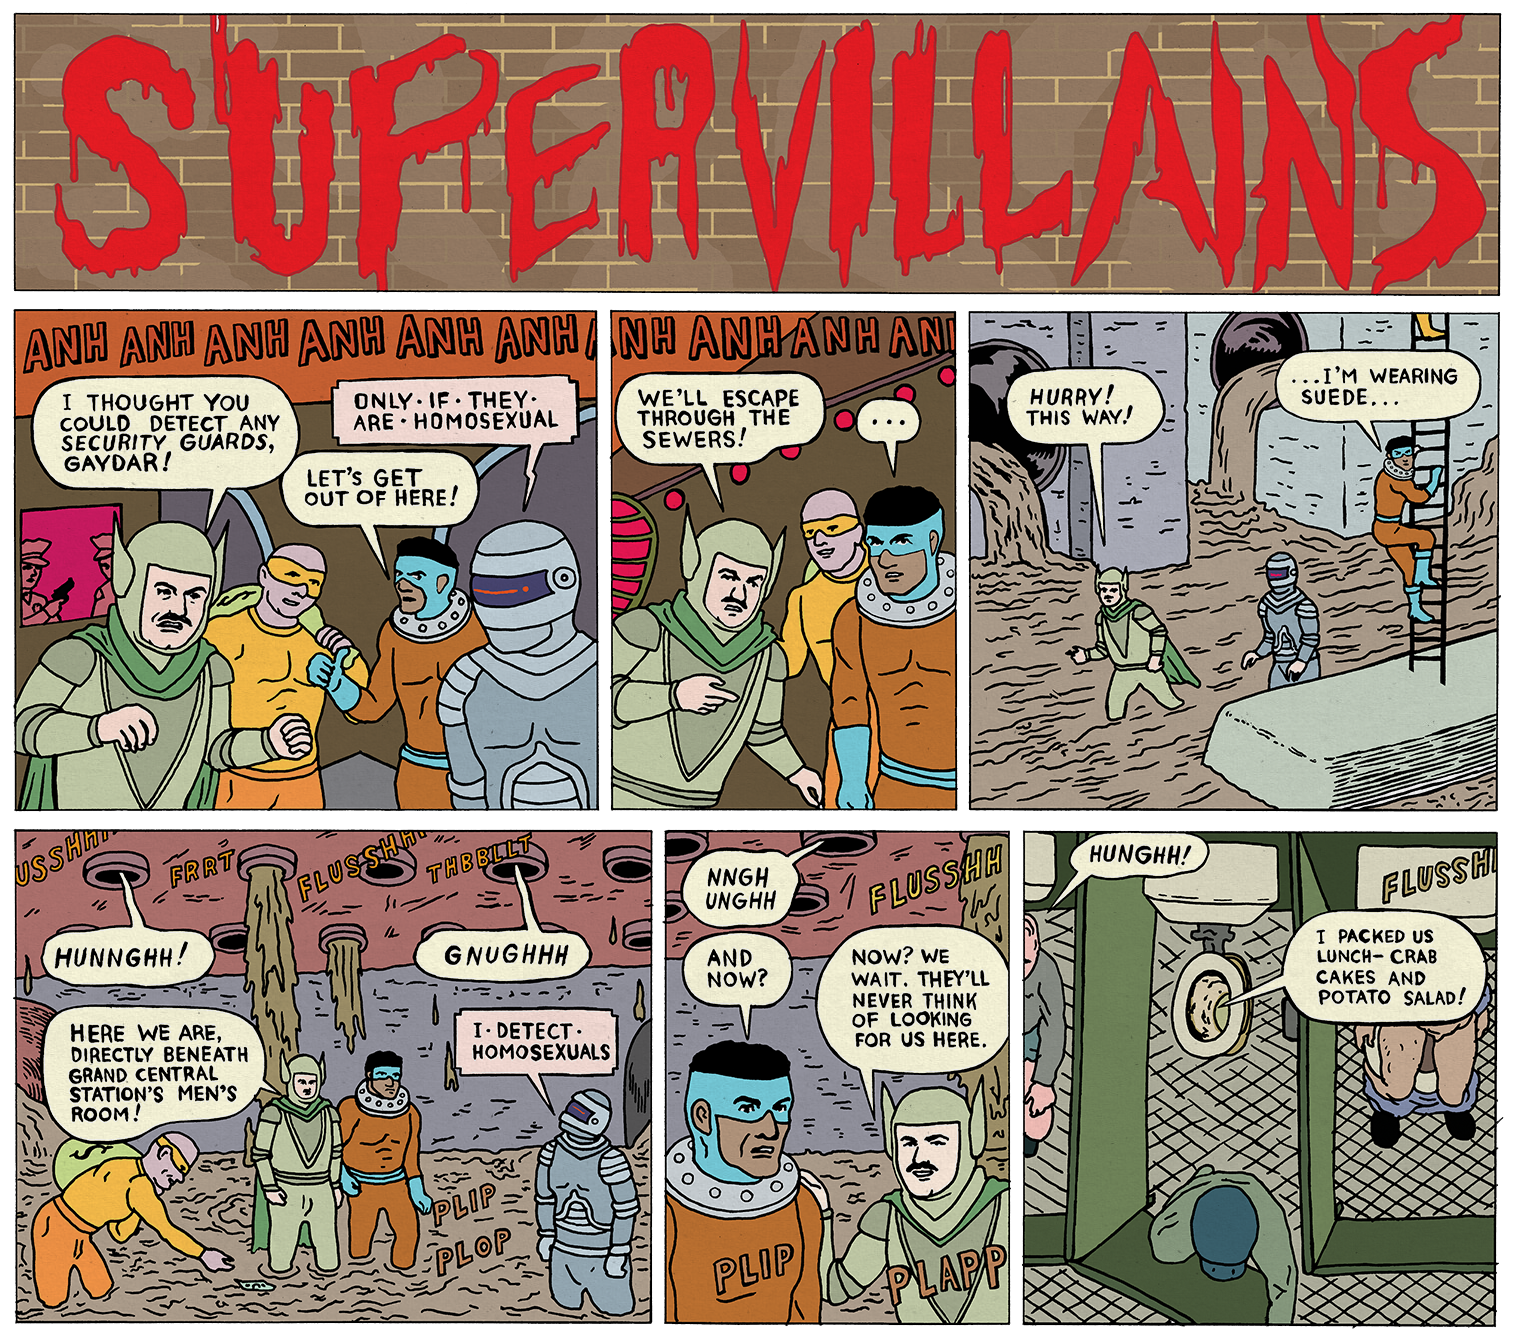 Supervillians by Michael Kupperman